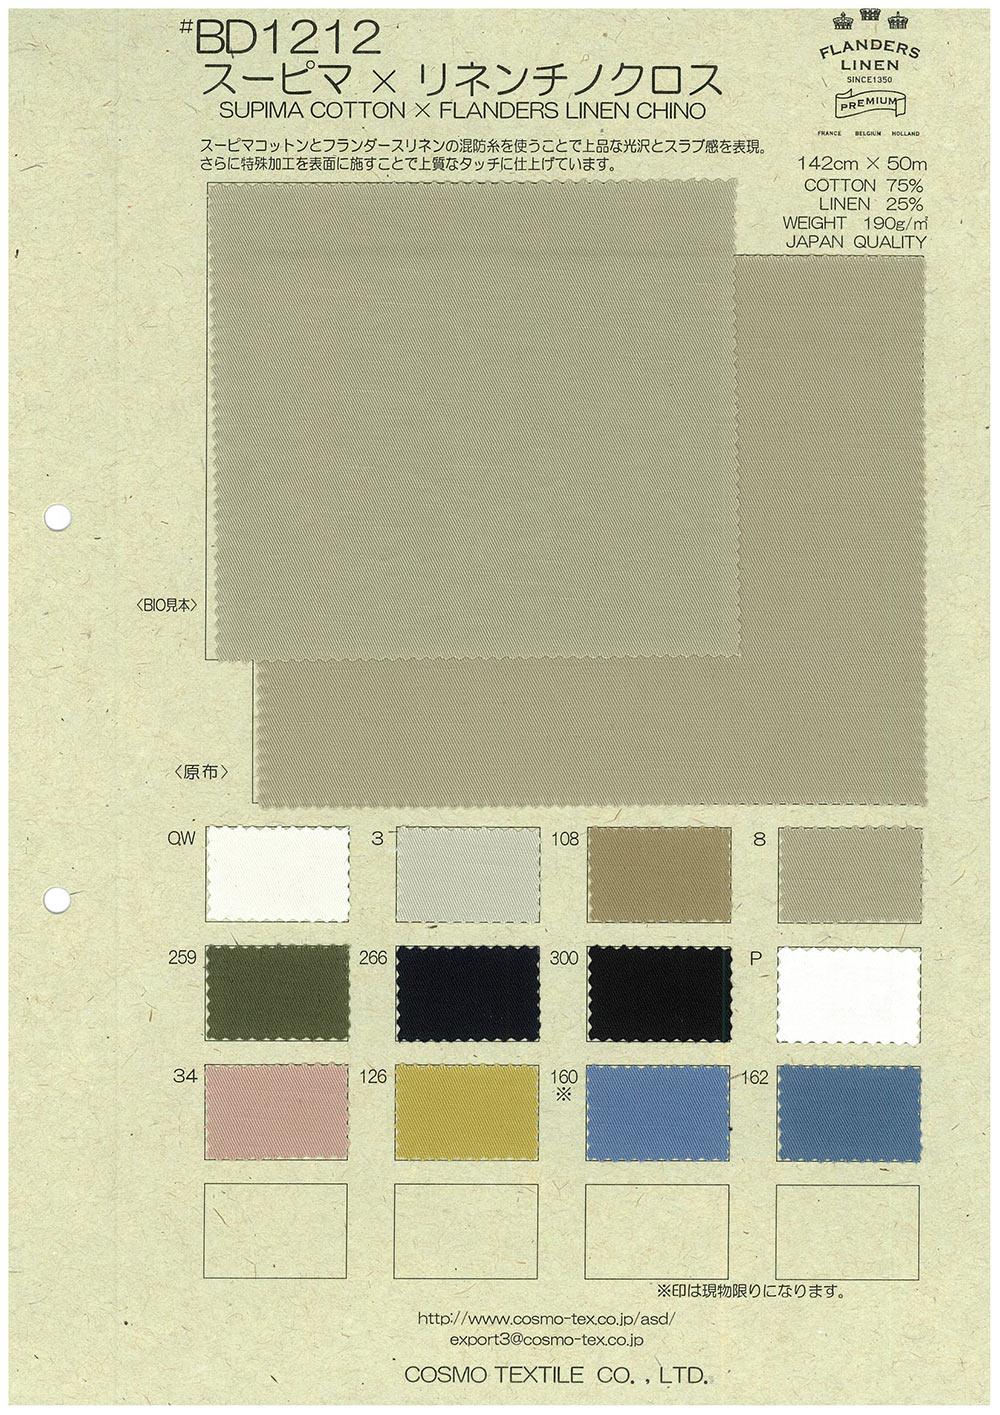 BD1212 スーピマ/リネン チノ[生地] コスモテキスタイル/オークラ商事 - ApparelX アパレル資材卸通販